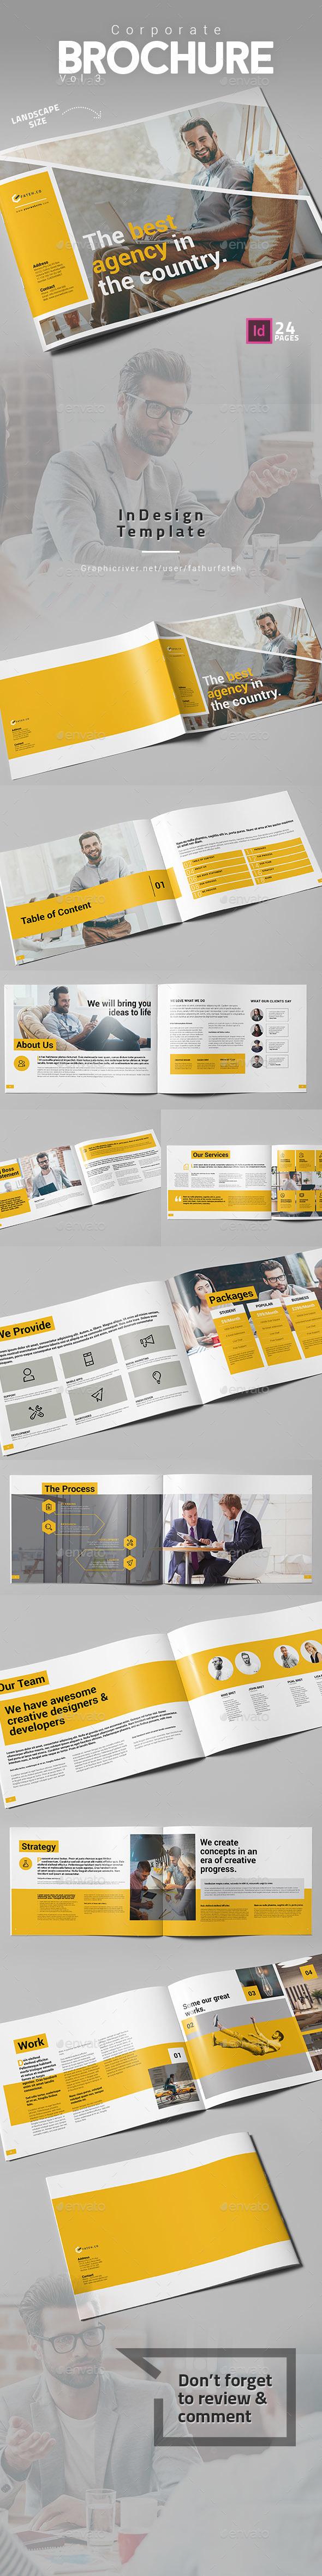 Corporate Brochure Vol.3 Landscape - Corporate Brochures